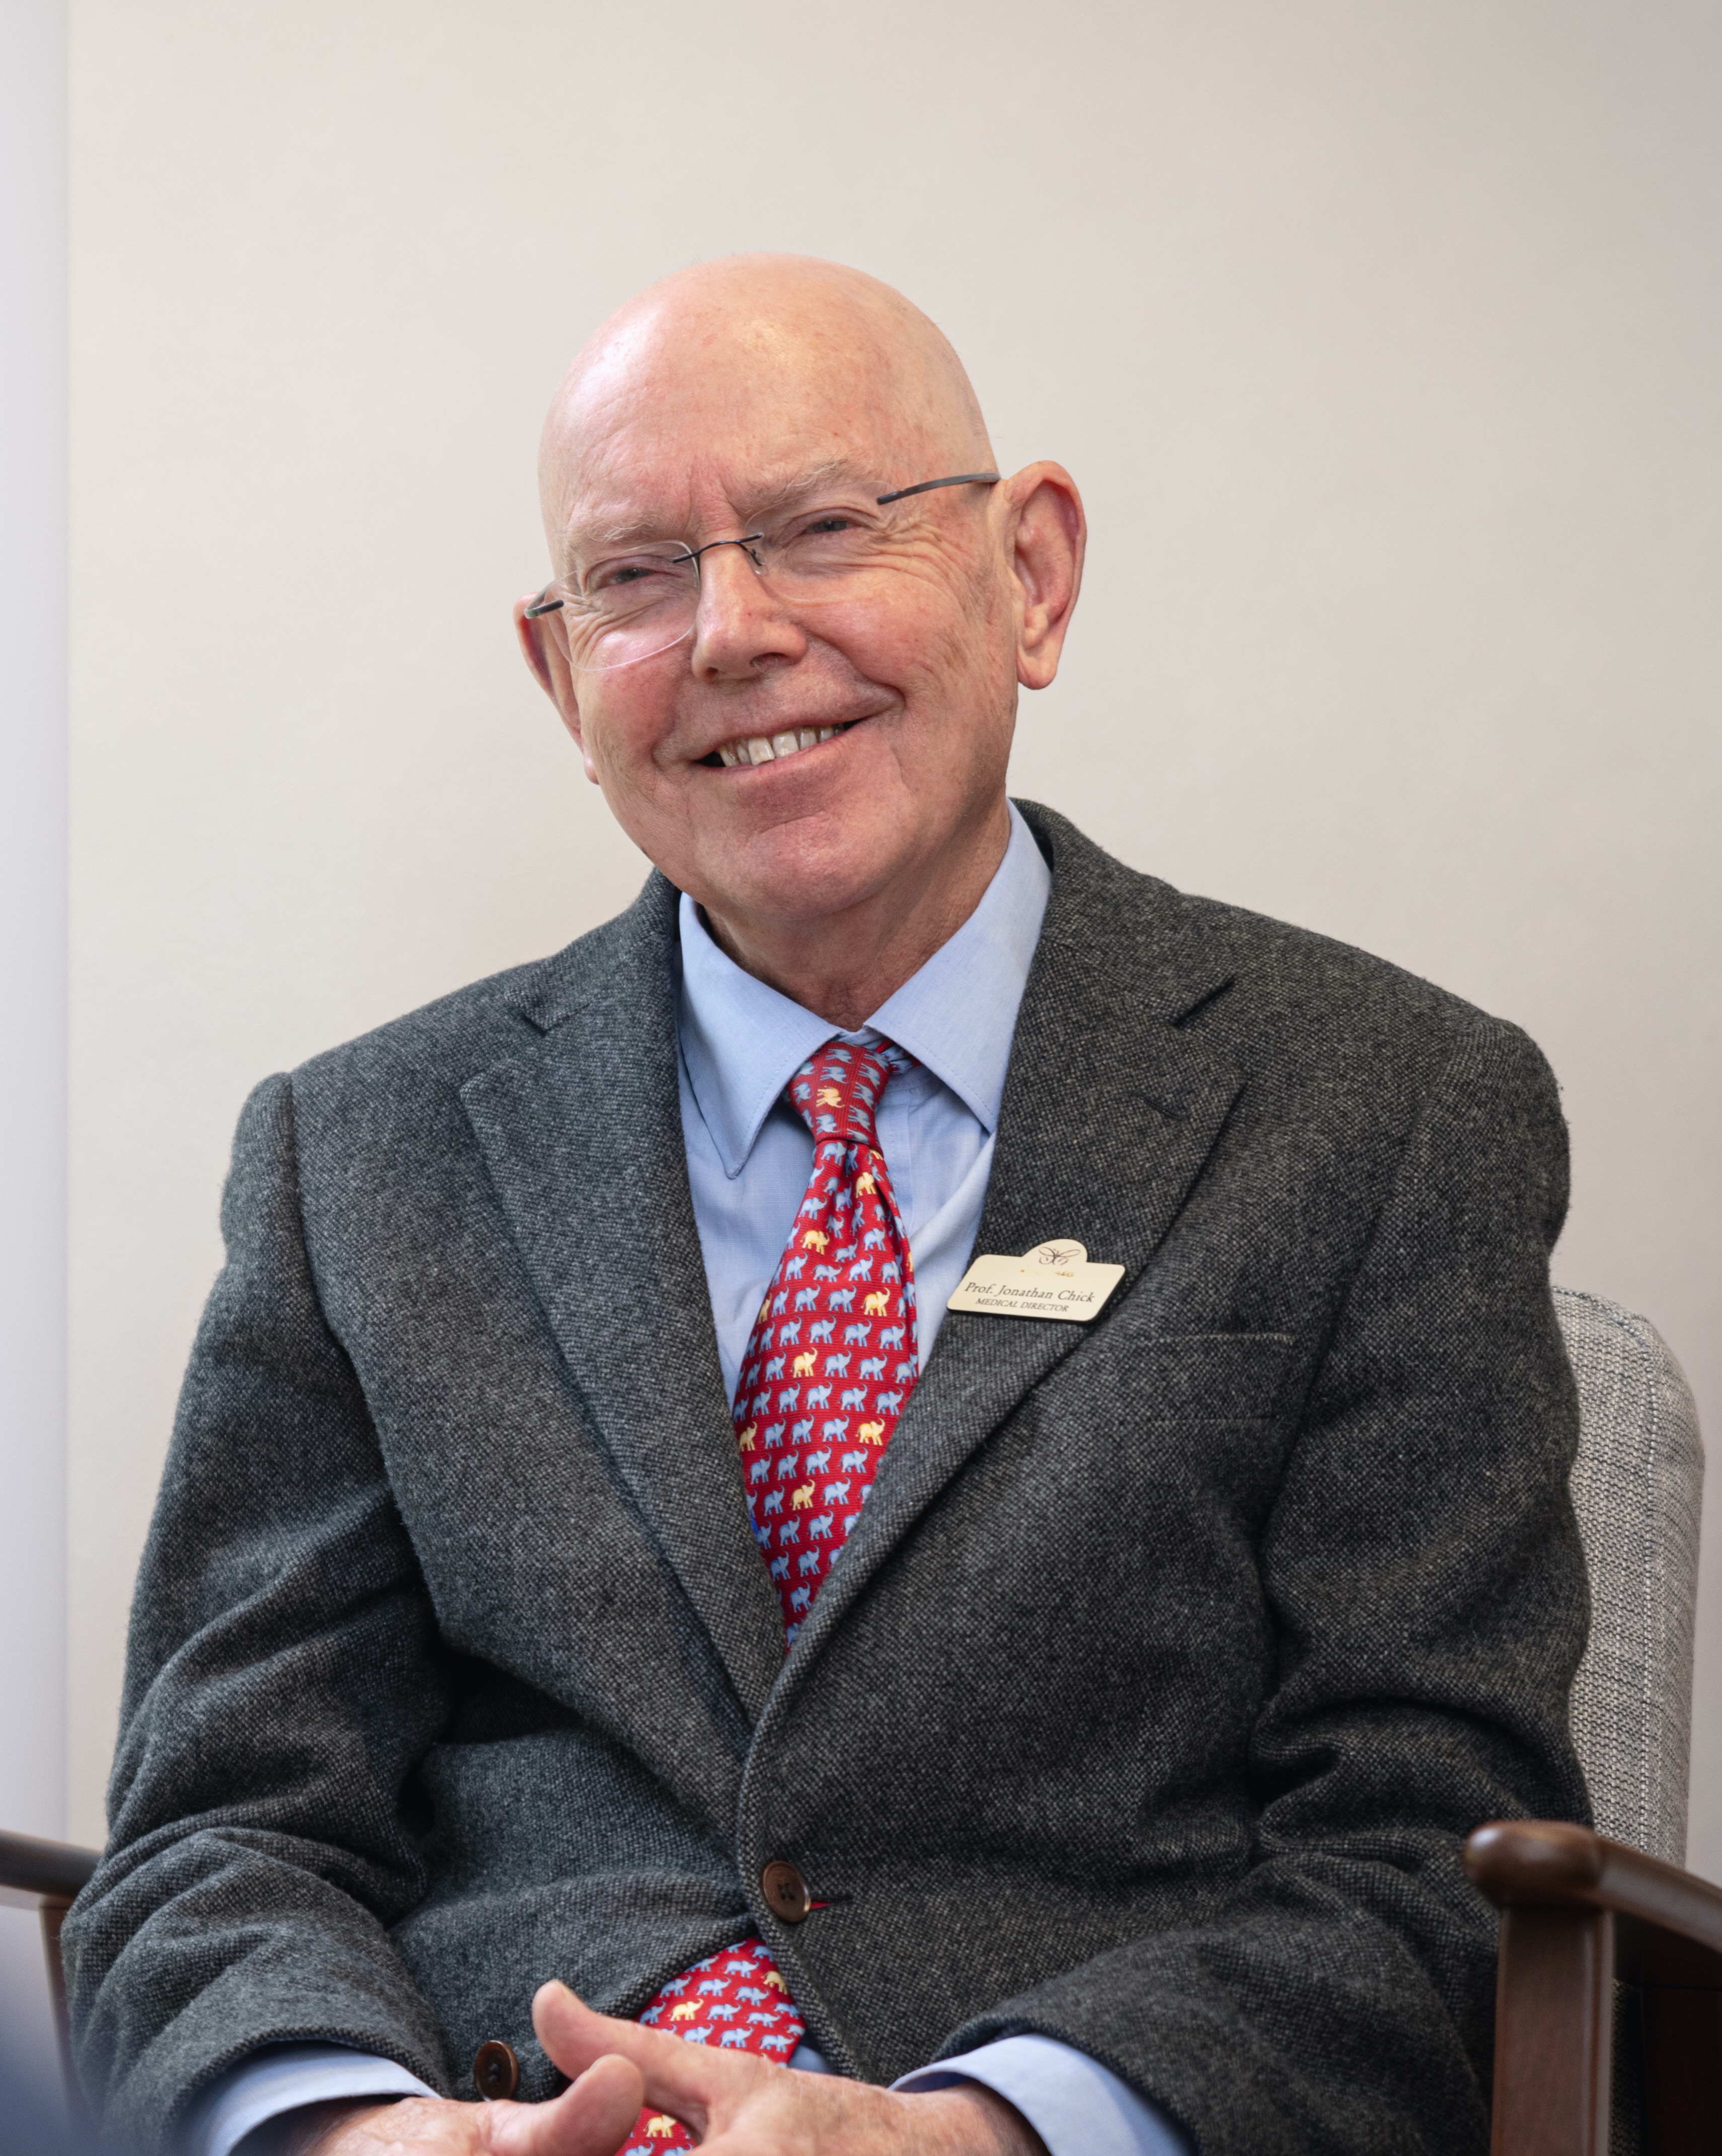 Professor Jonathan Chick